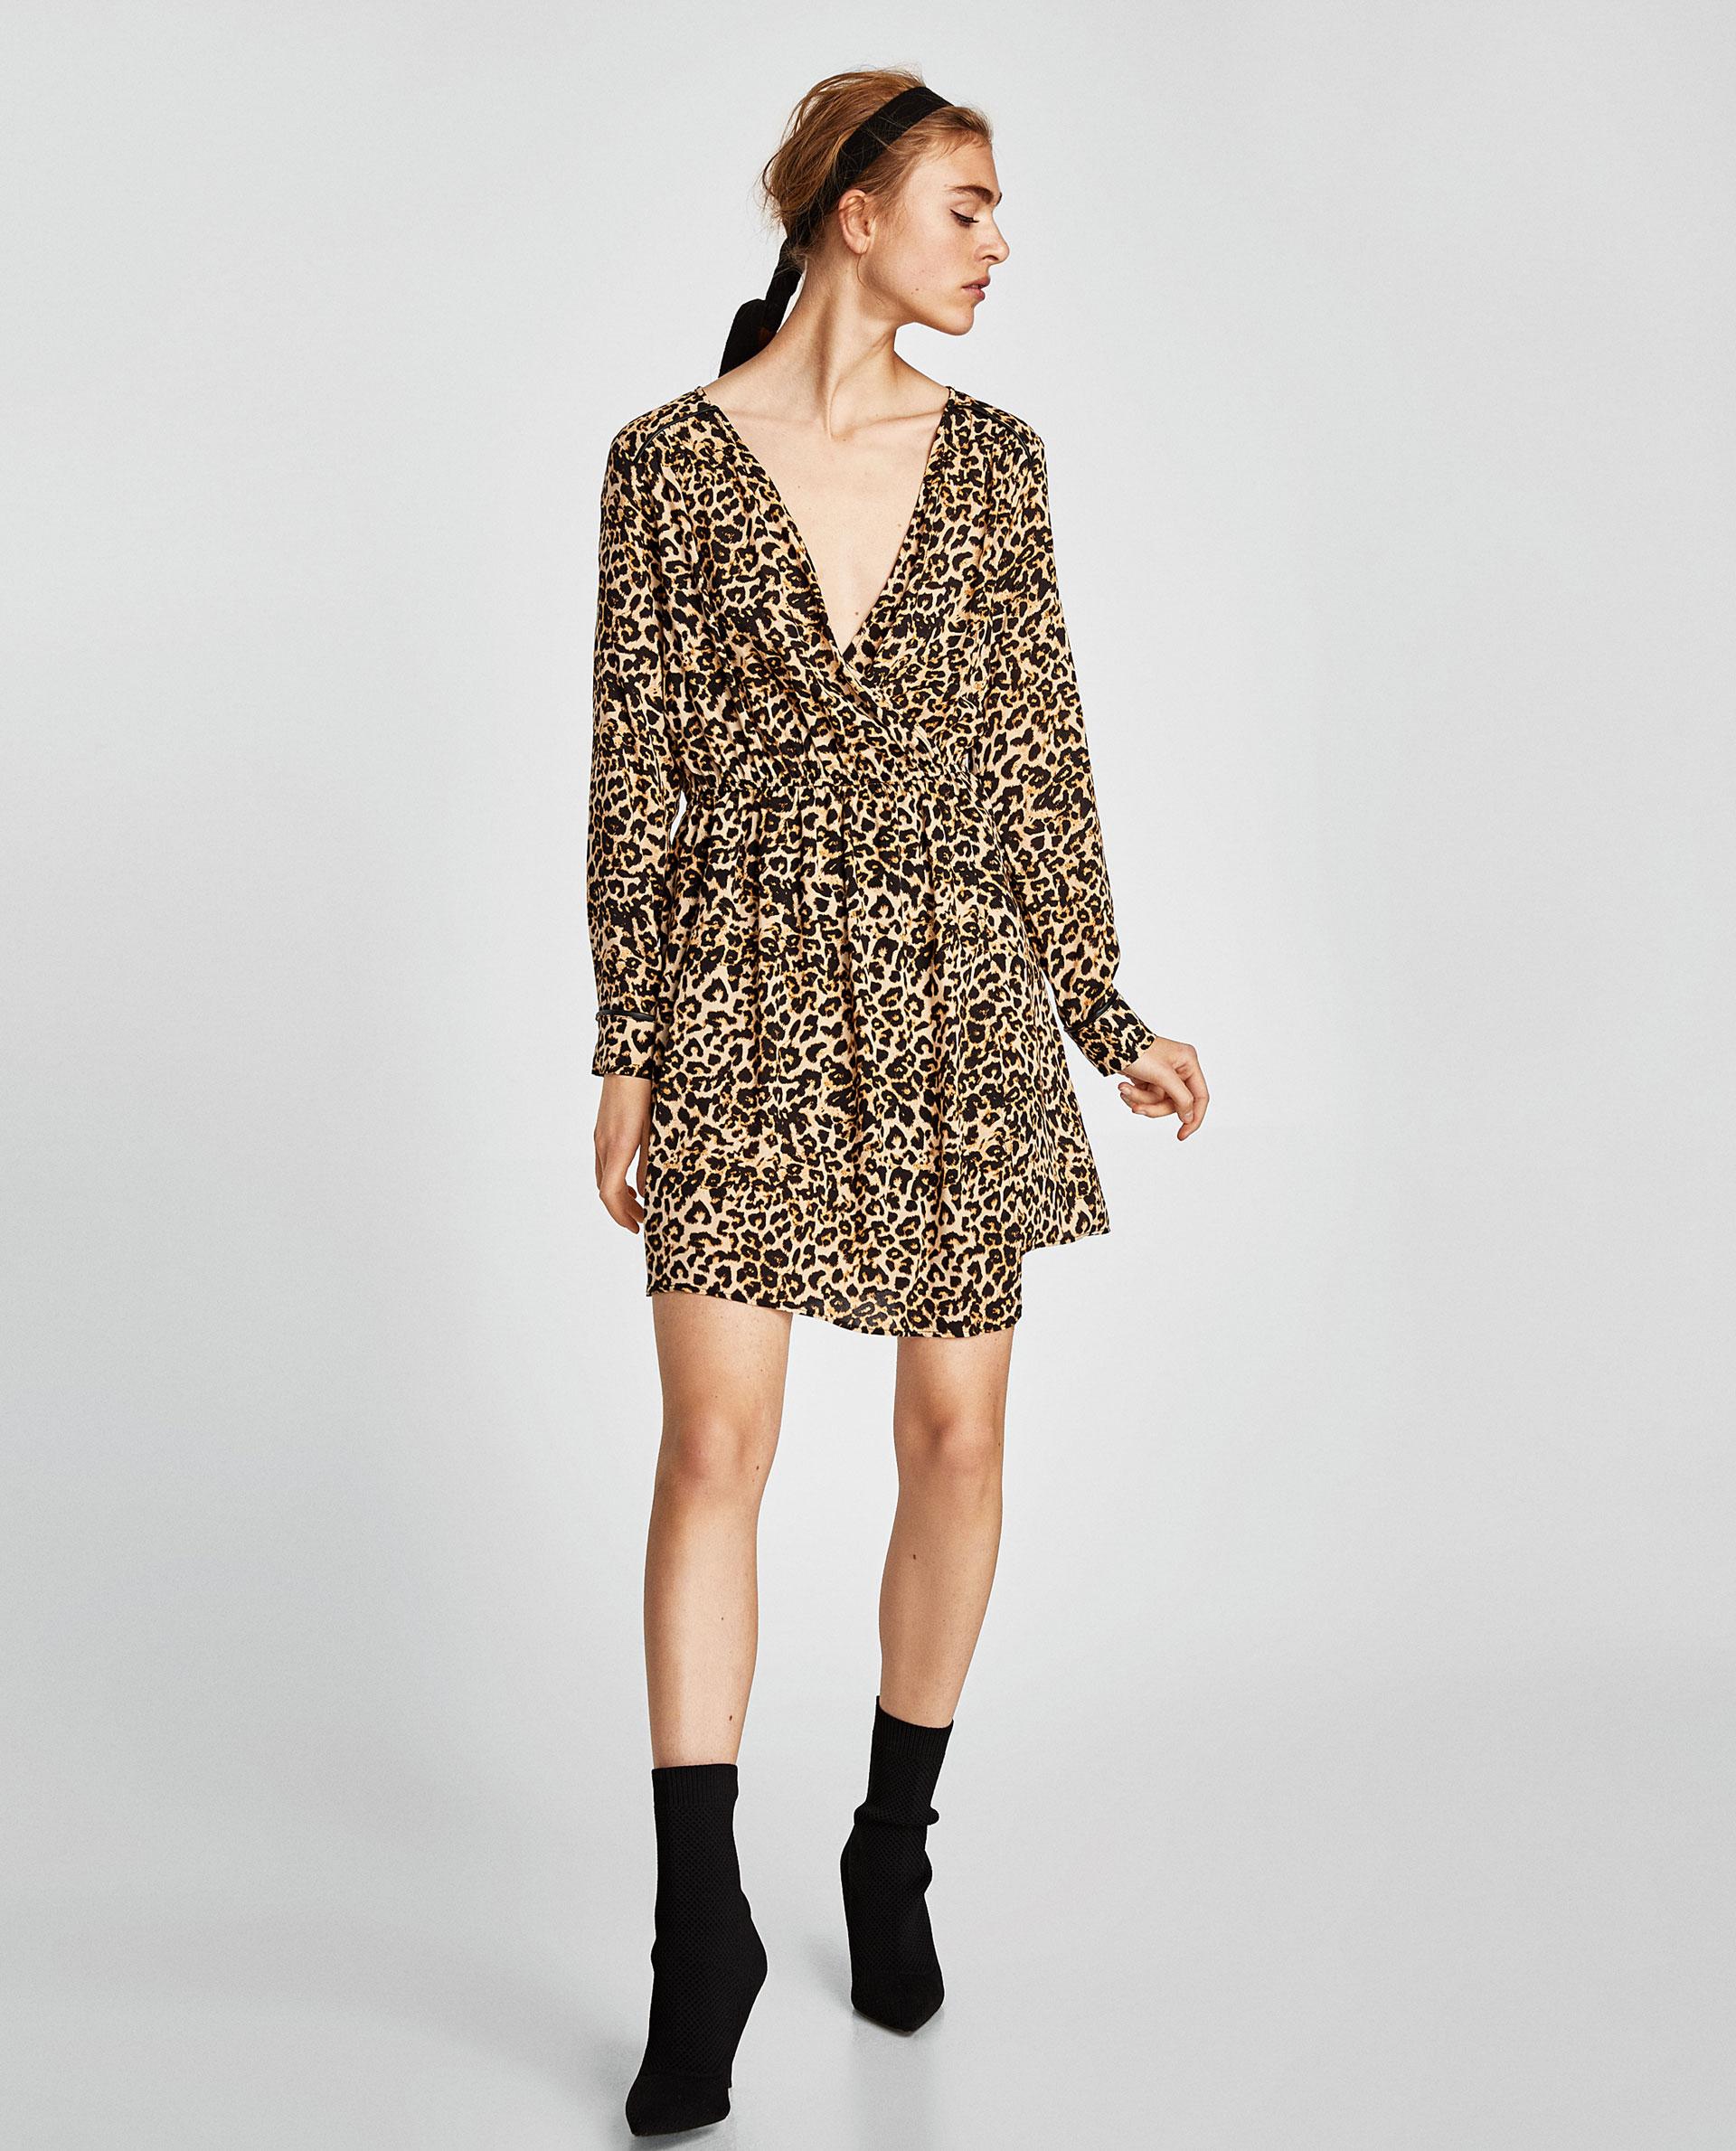 zara, leopard, fêtes, robe